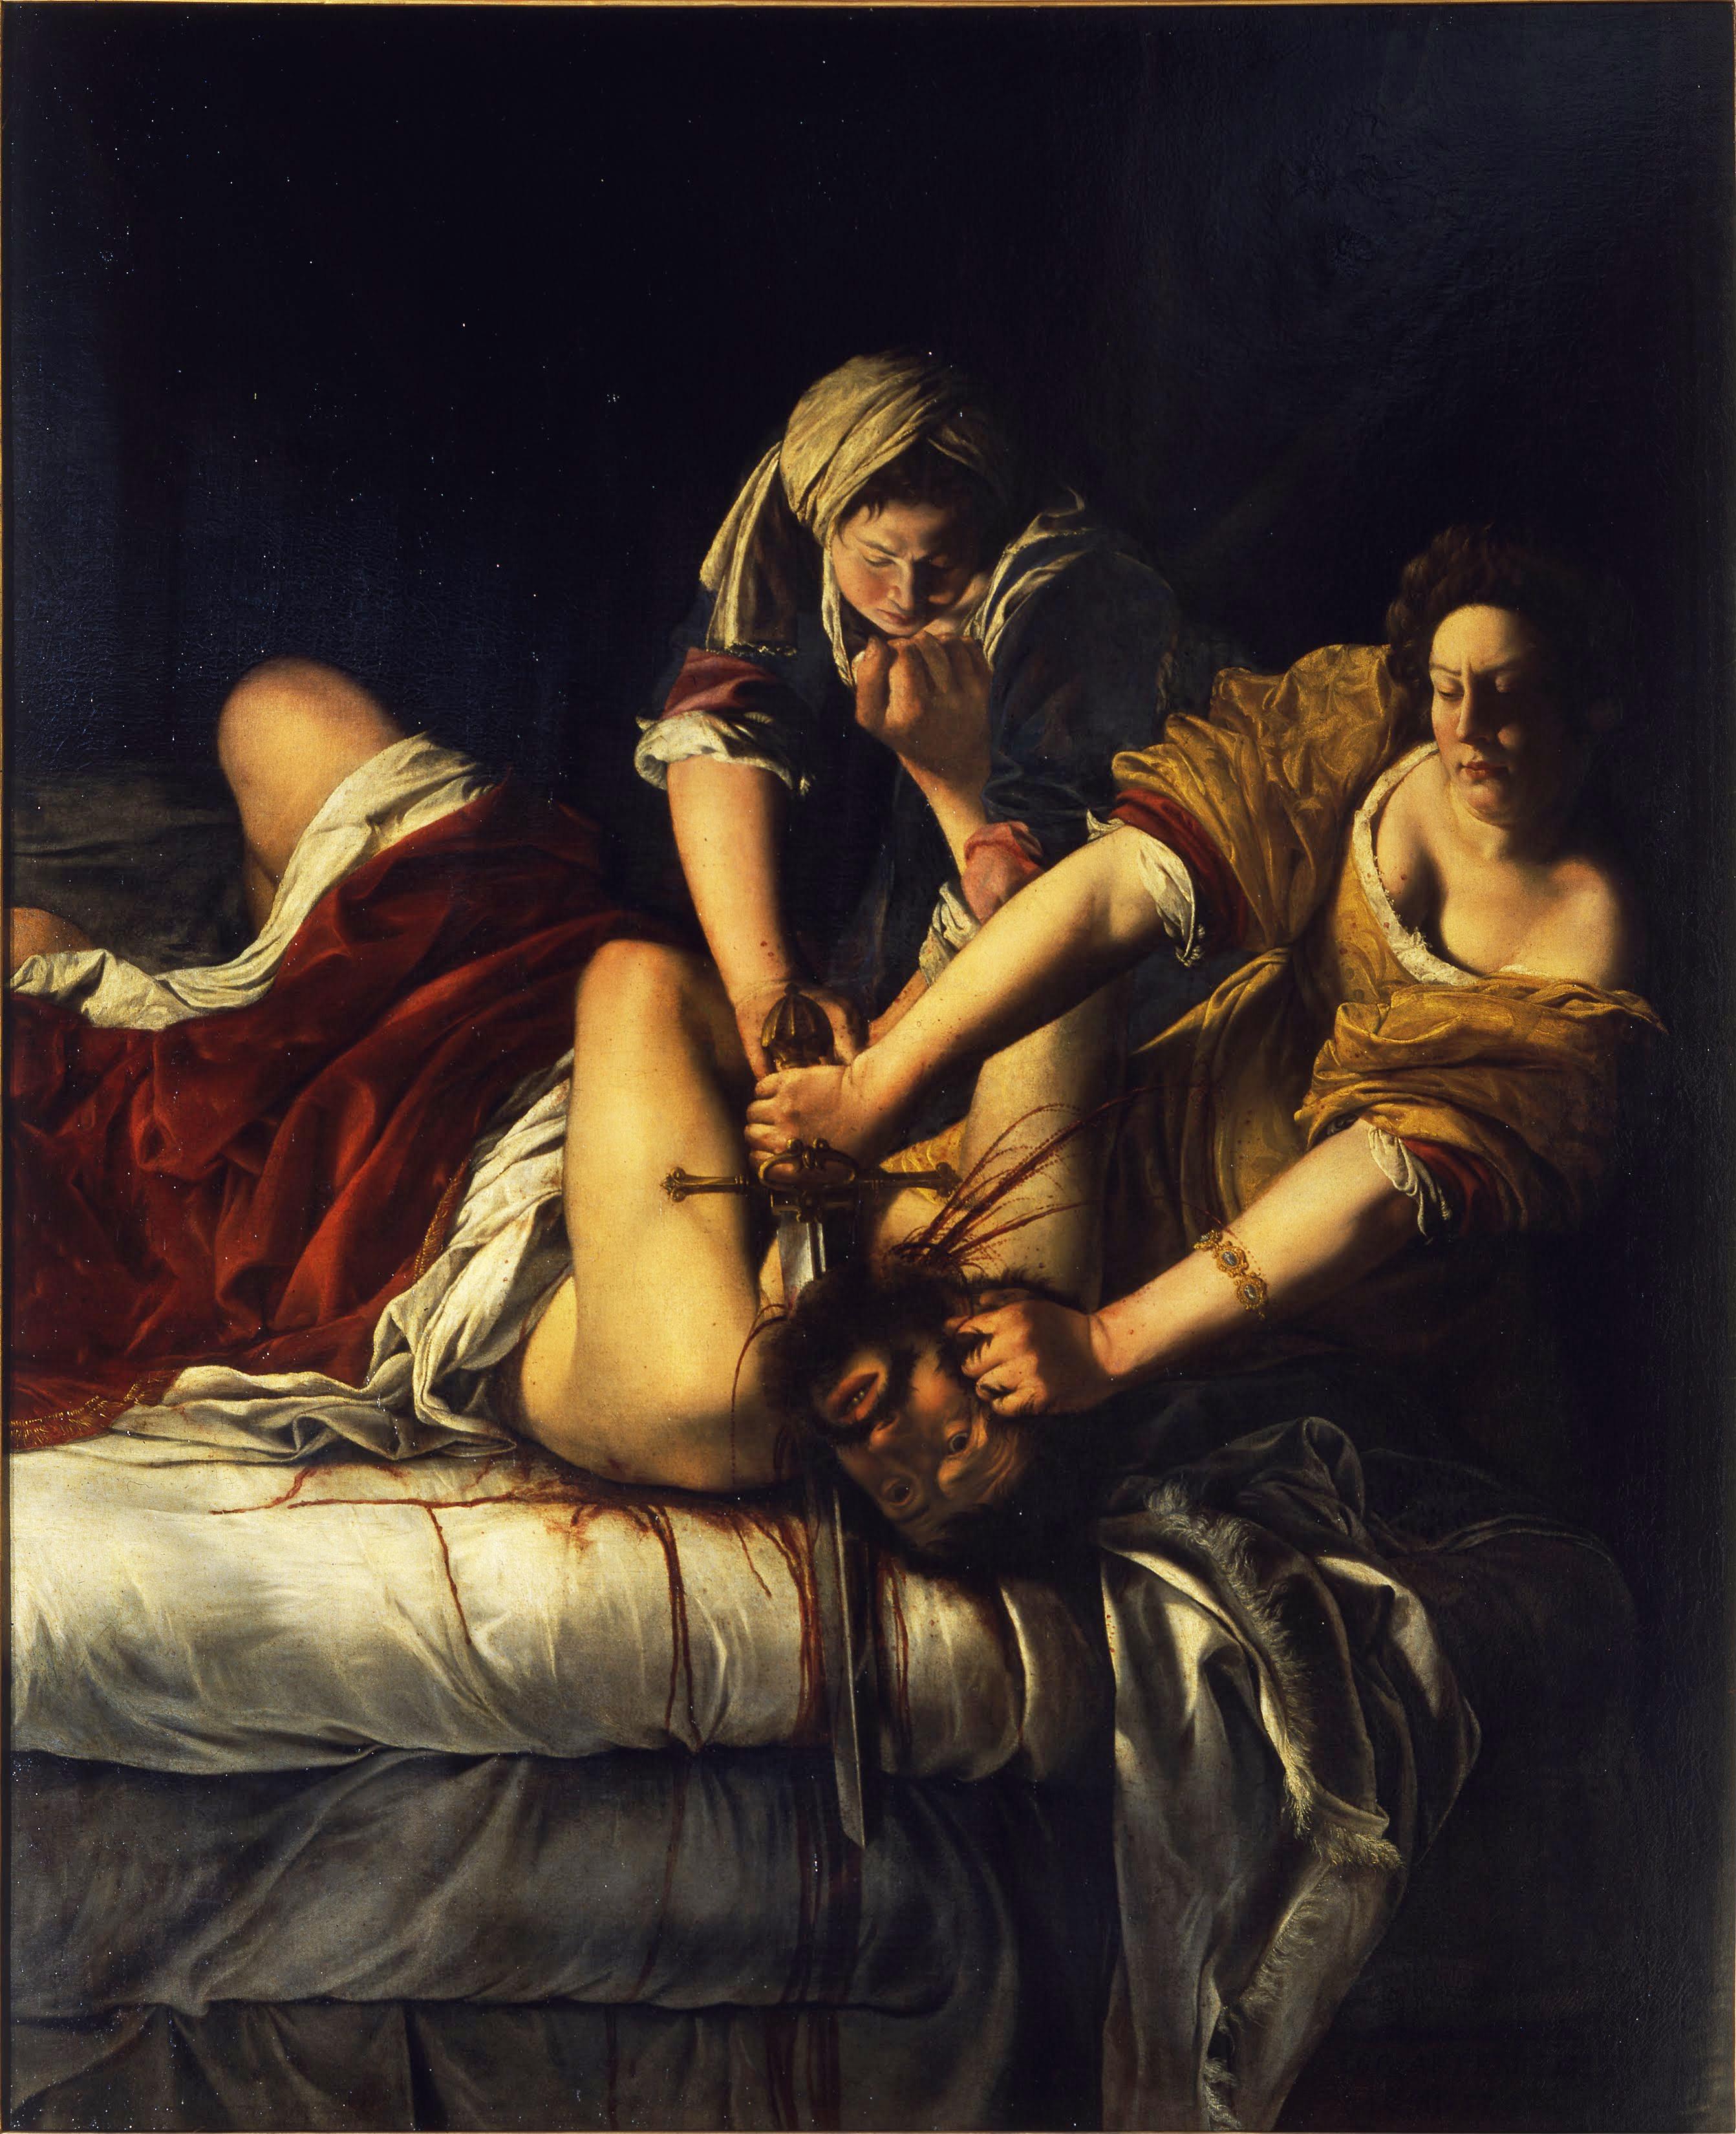 Artemisia_Gentileschi_-_Giuditta_decapita_Oloferne_-_Google_Art_Project-Adjust.jpg